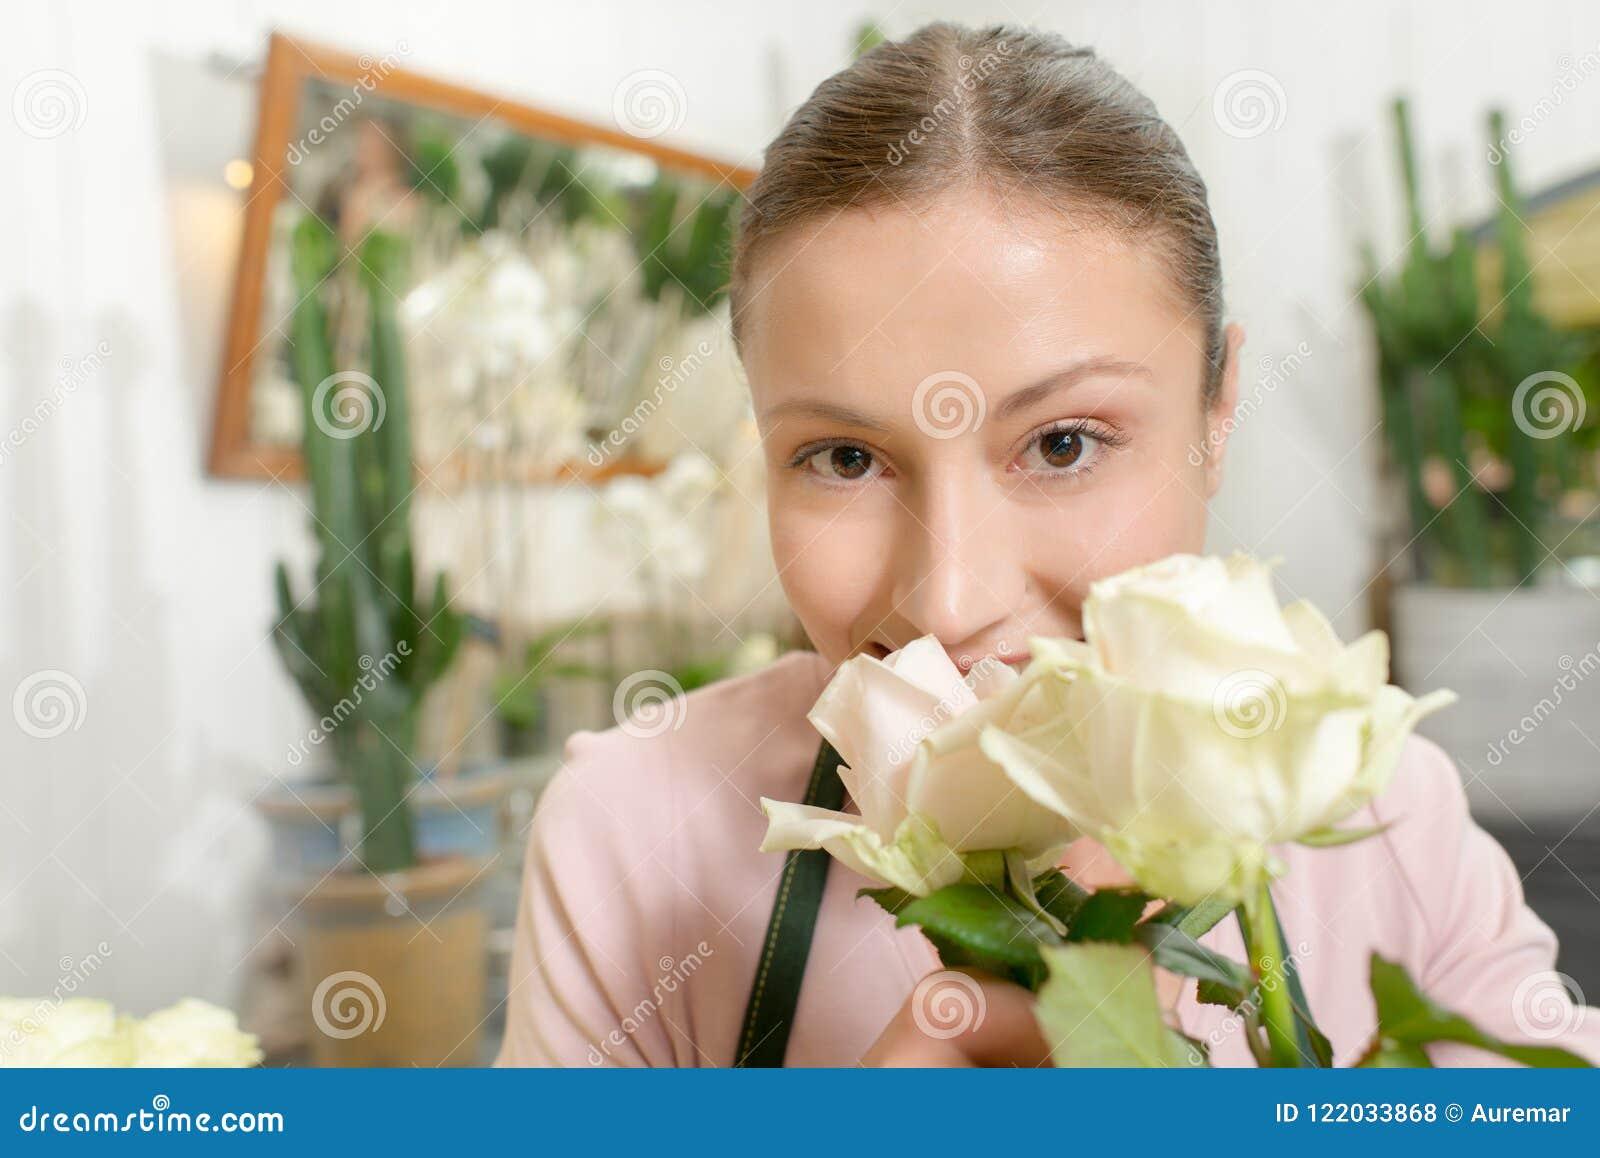 Blomsterhandlare som luktar vita rosor